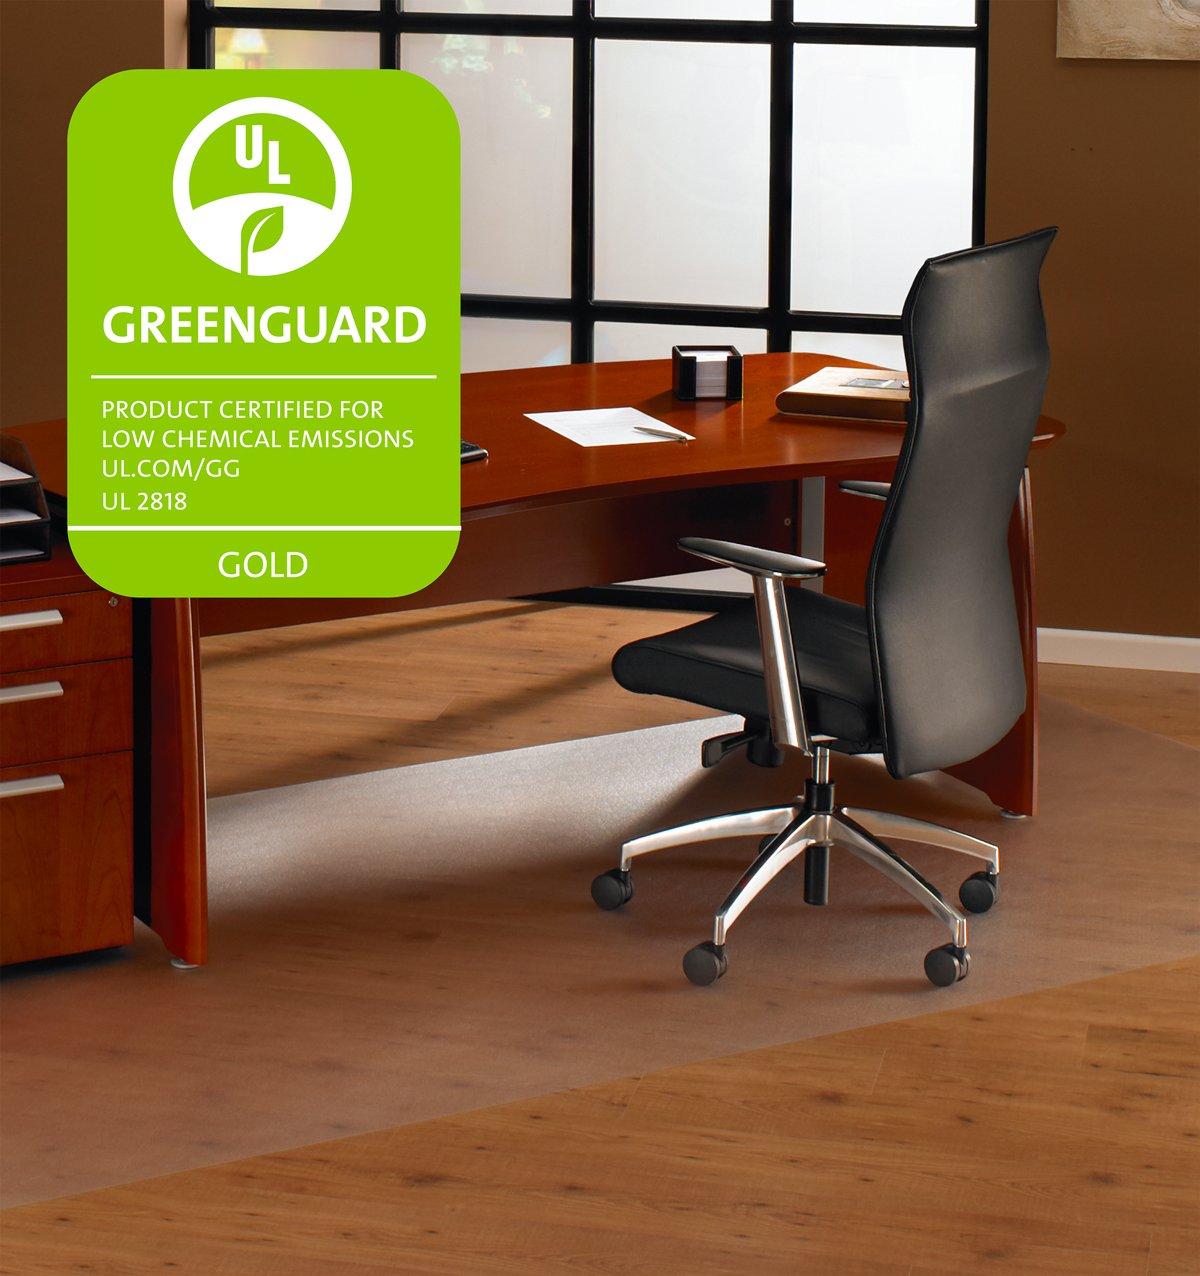 floortex polycarbonate chair mats for deep pile carpets rectangular